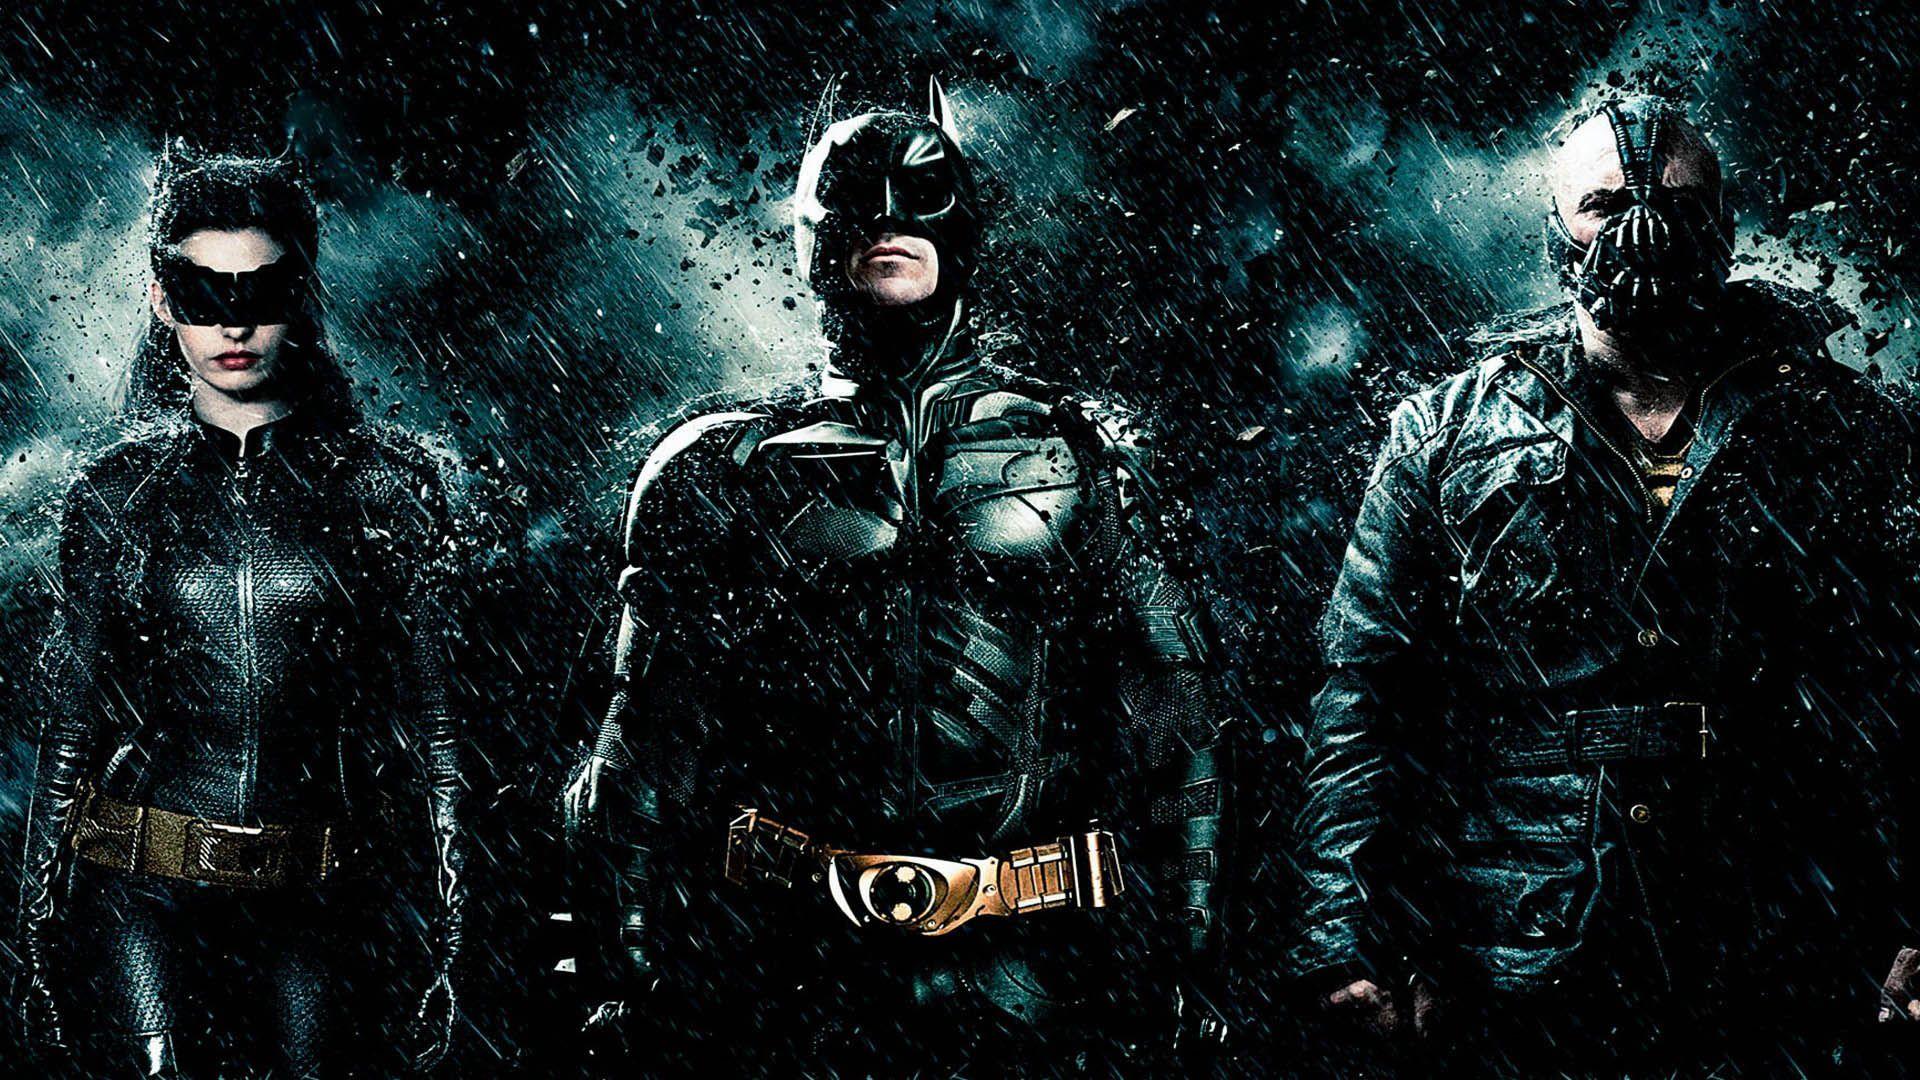 units of Batman Hd Wallpapers 19201200 Batman Wallpapers Full HD